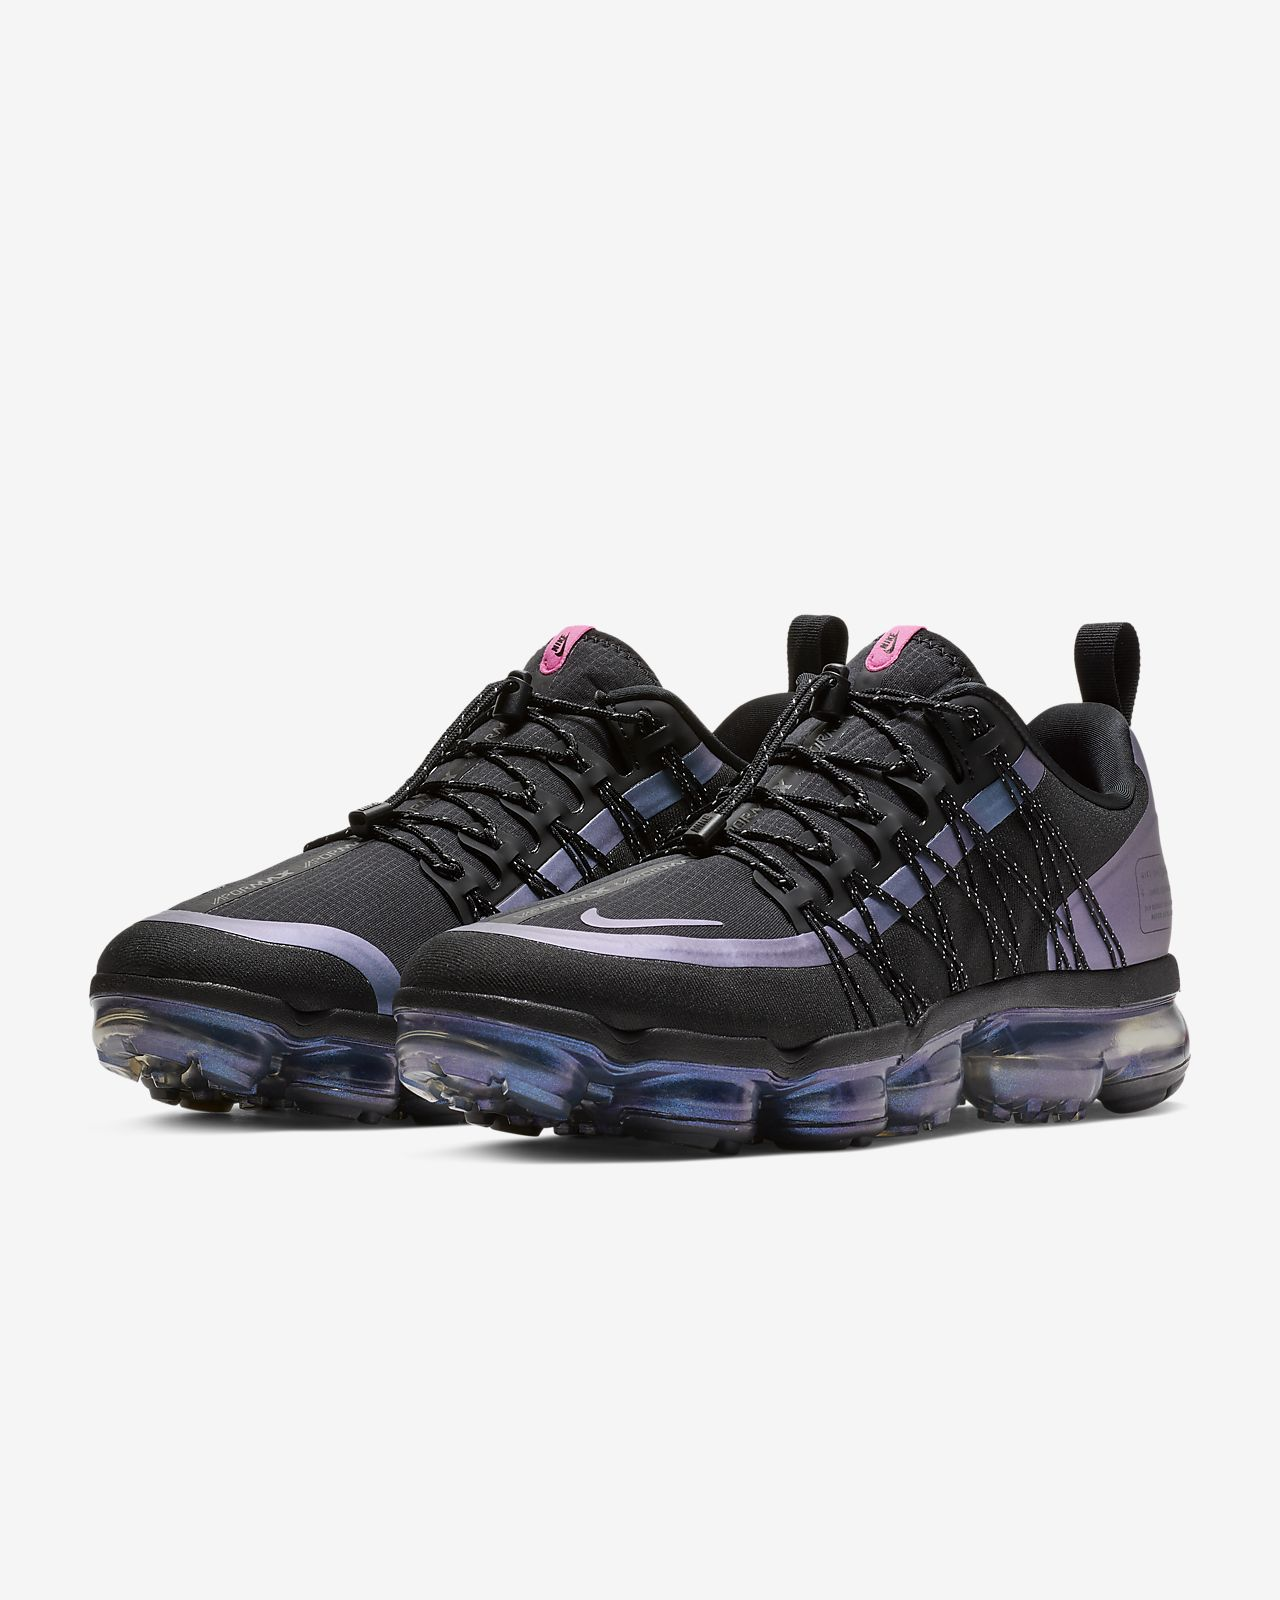 Chaussure Nike Air VaporMax Utility pour Homme